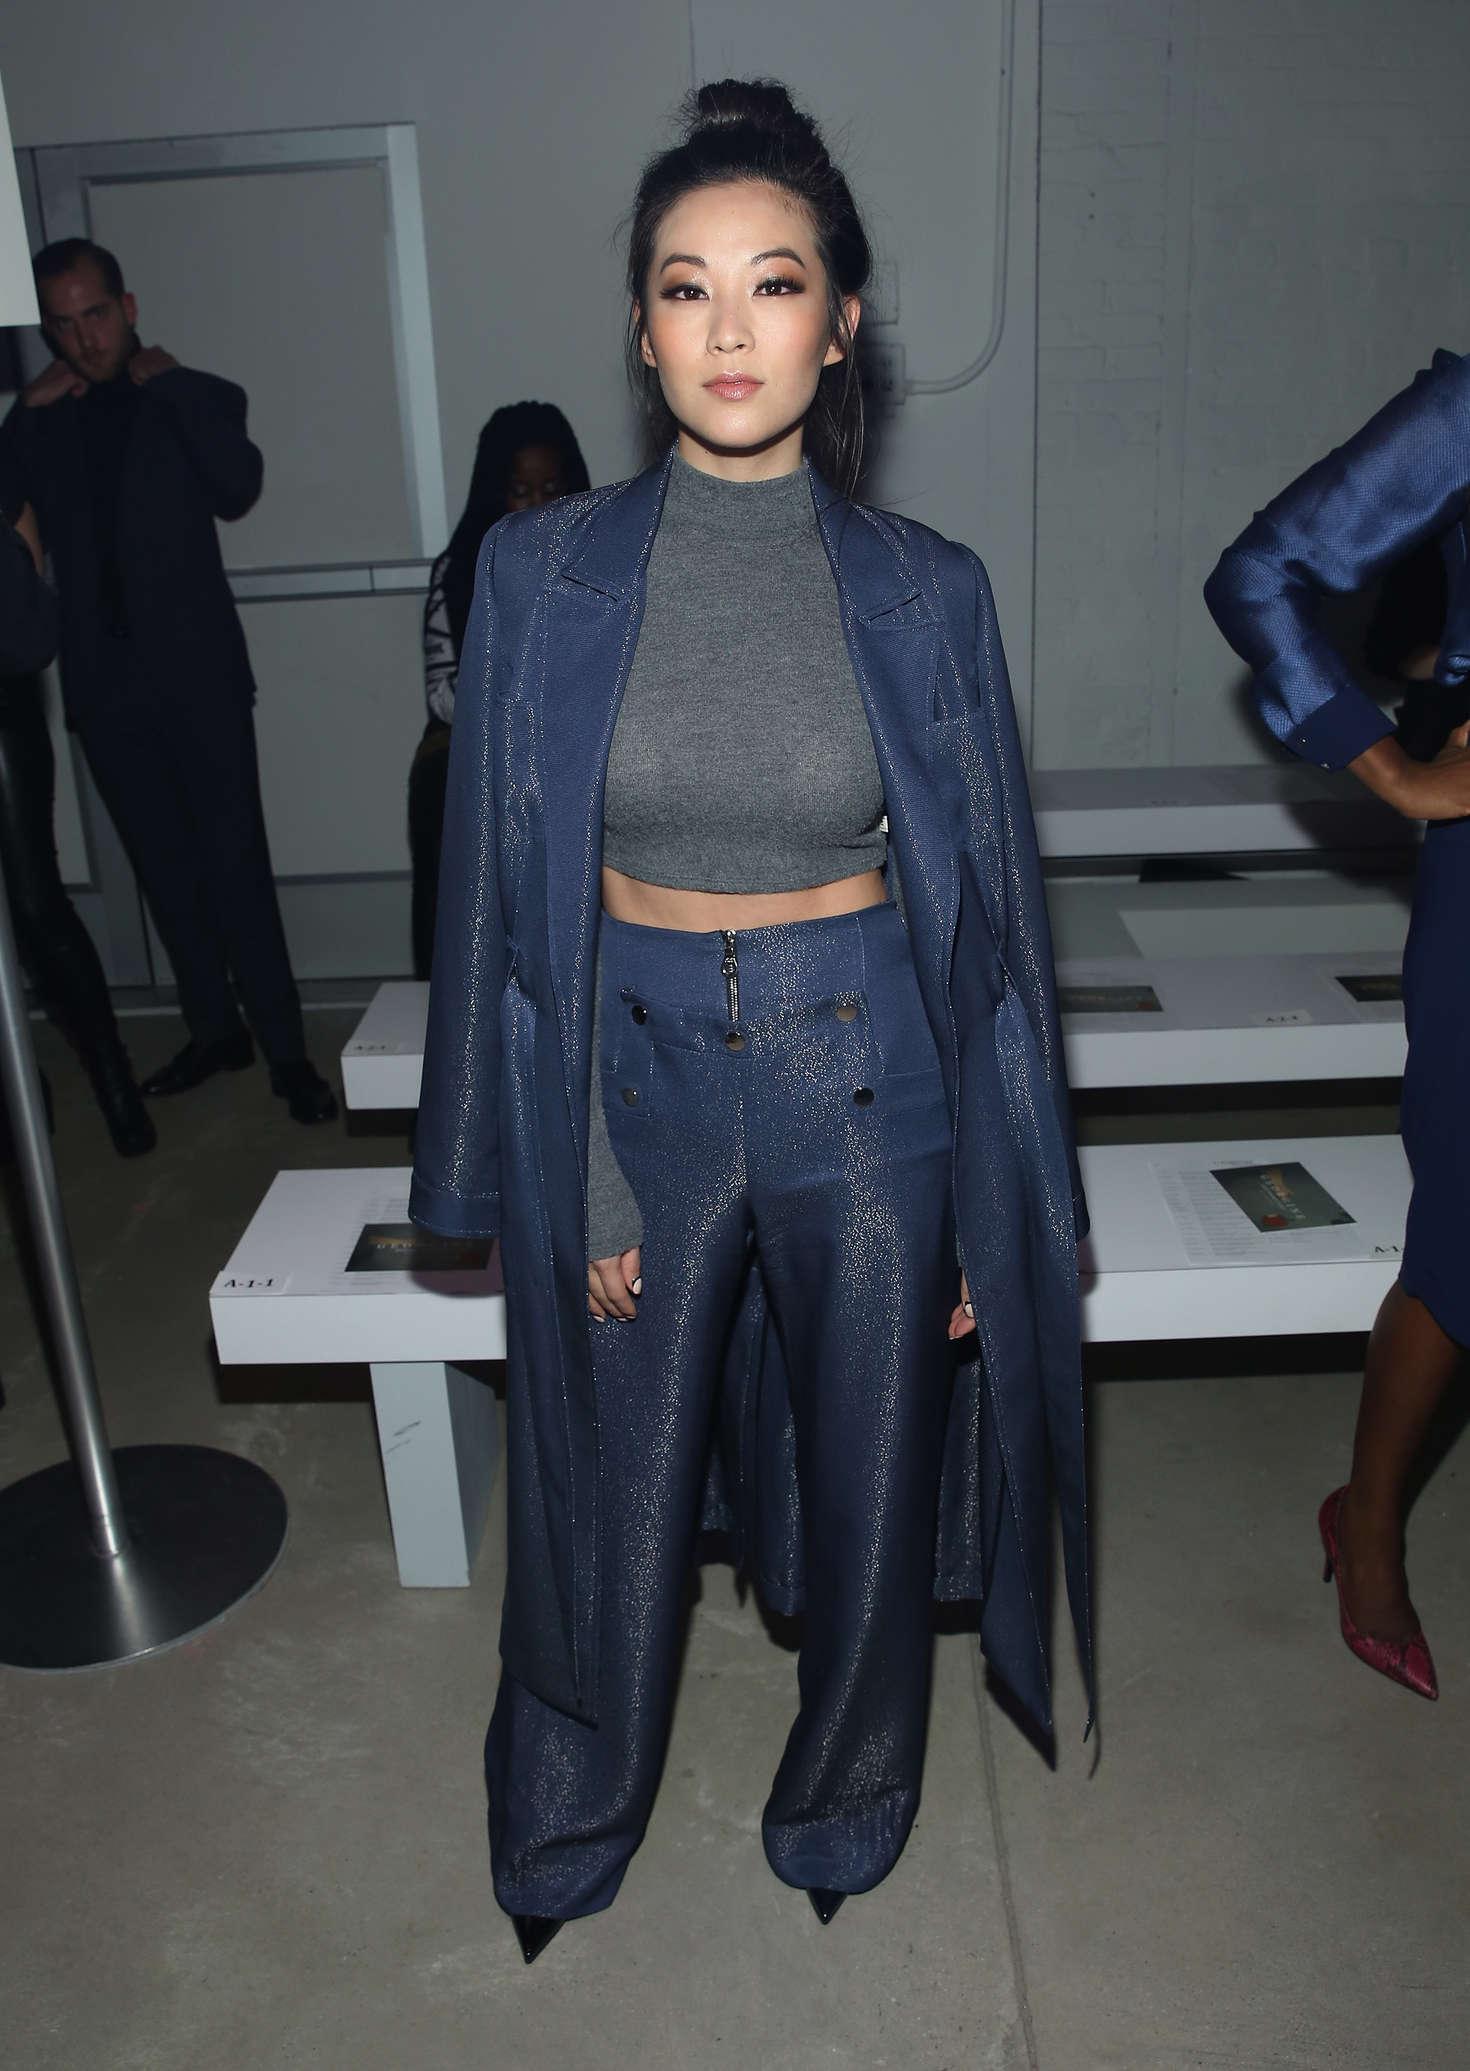 Arden Cho Georgine Fashion Show in New York